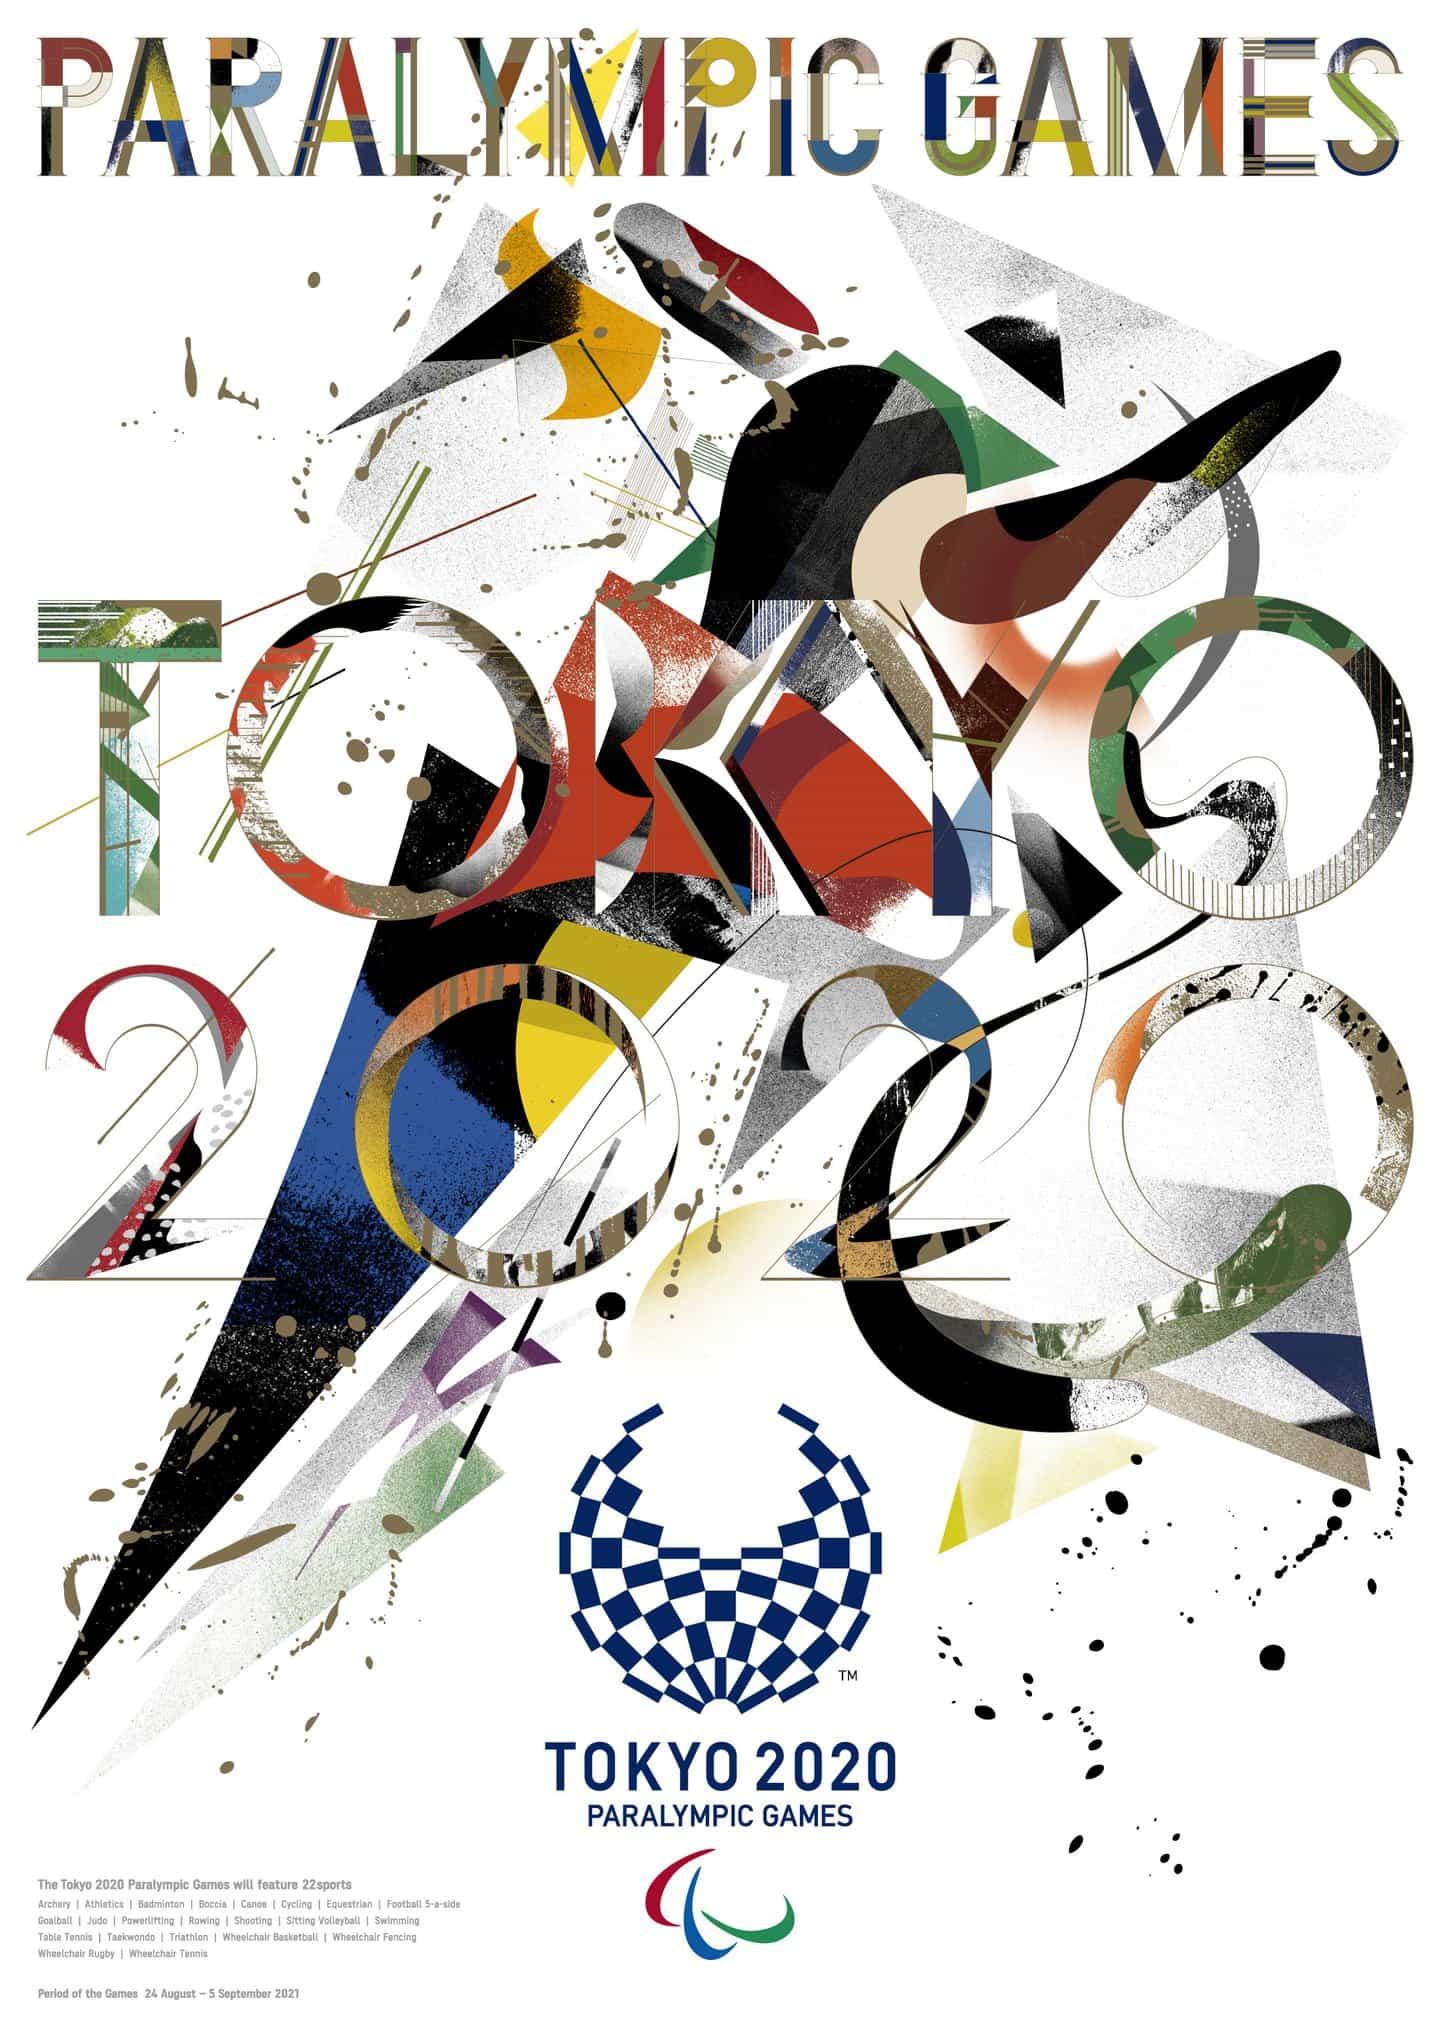 Goo Choki Par: Carteles de los Juegos Paralímpicos (Copyright © Comité Paralímpico Internacional, 2020)